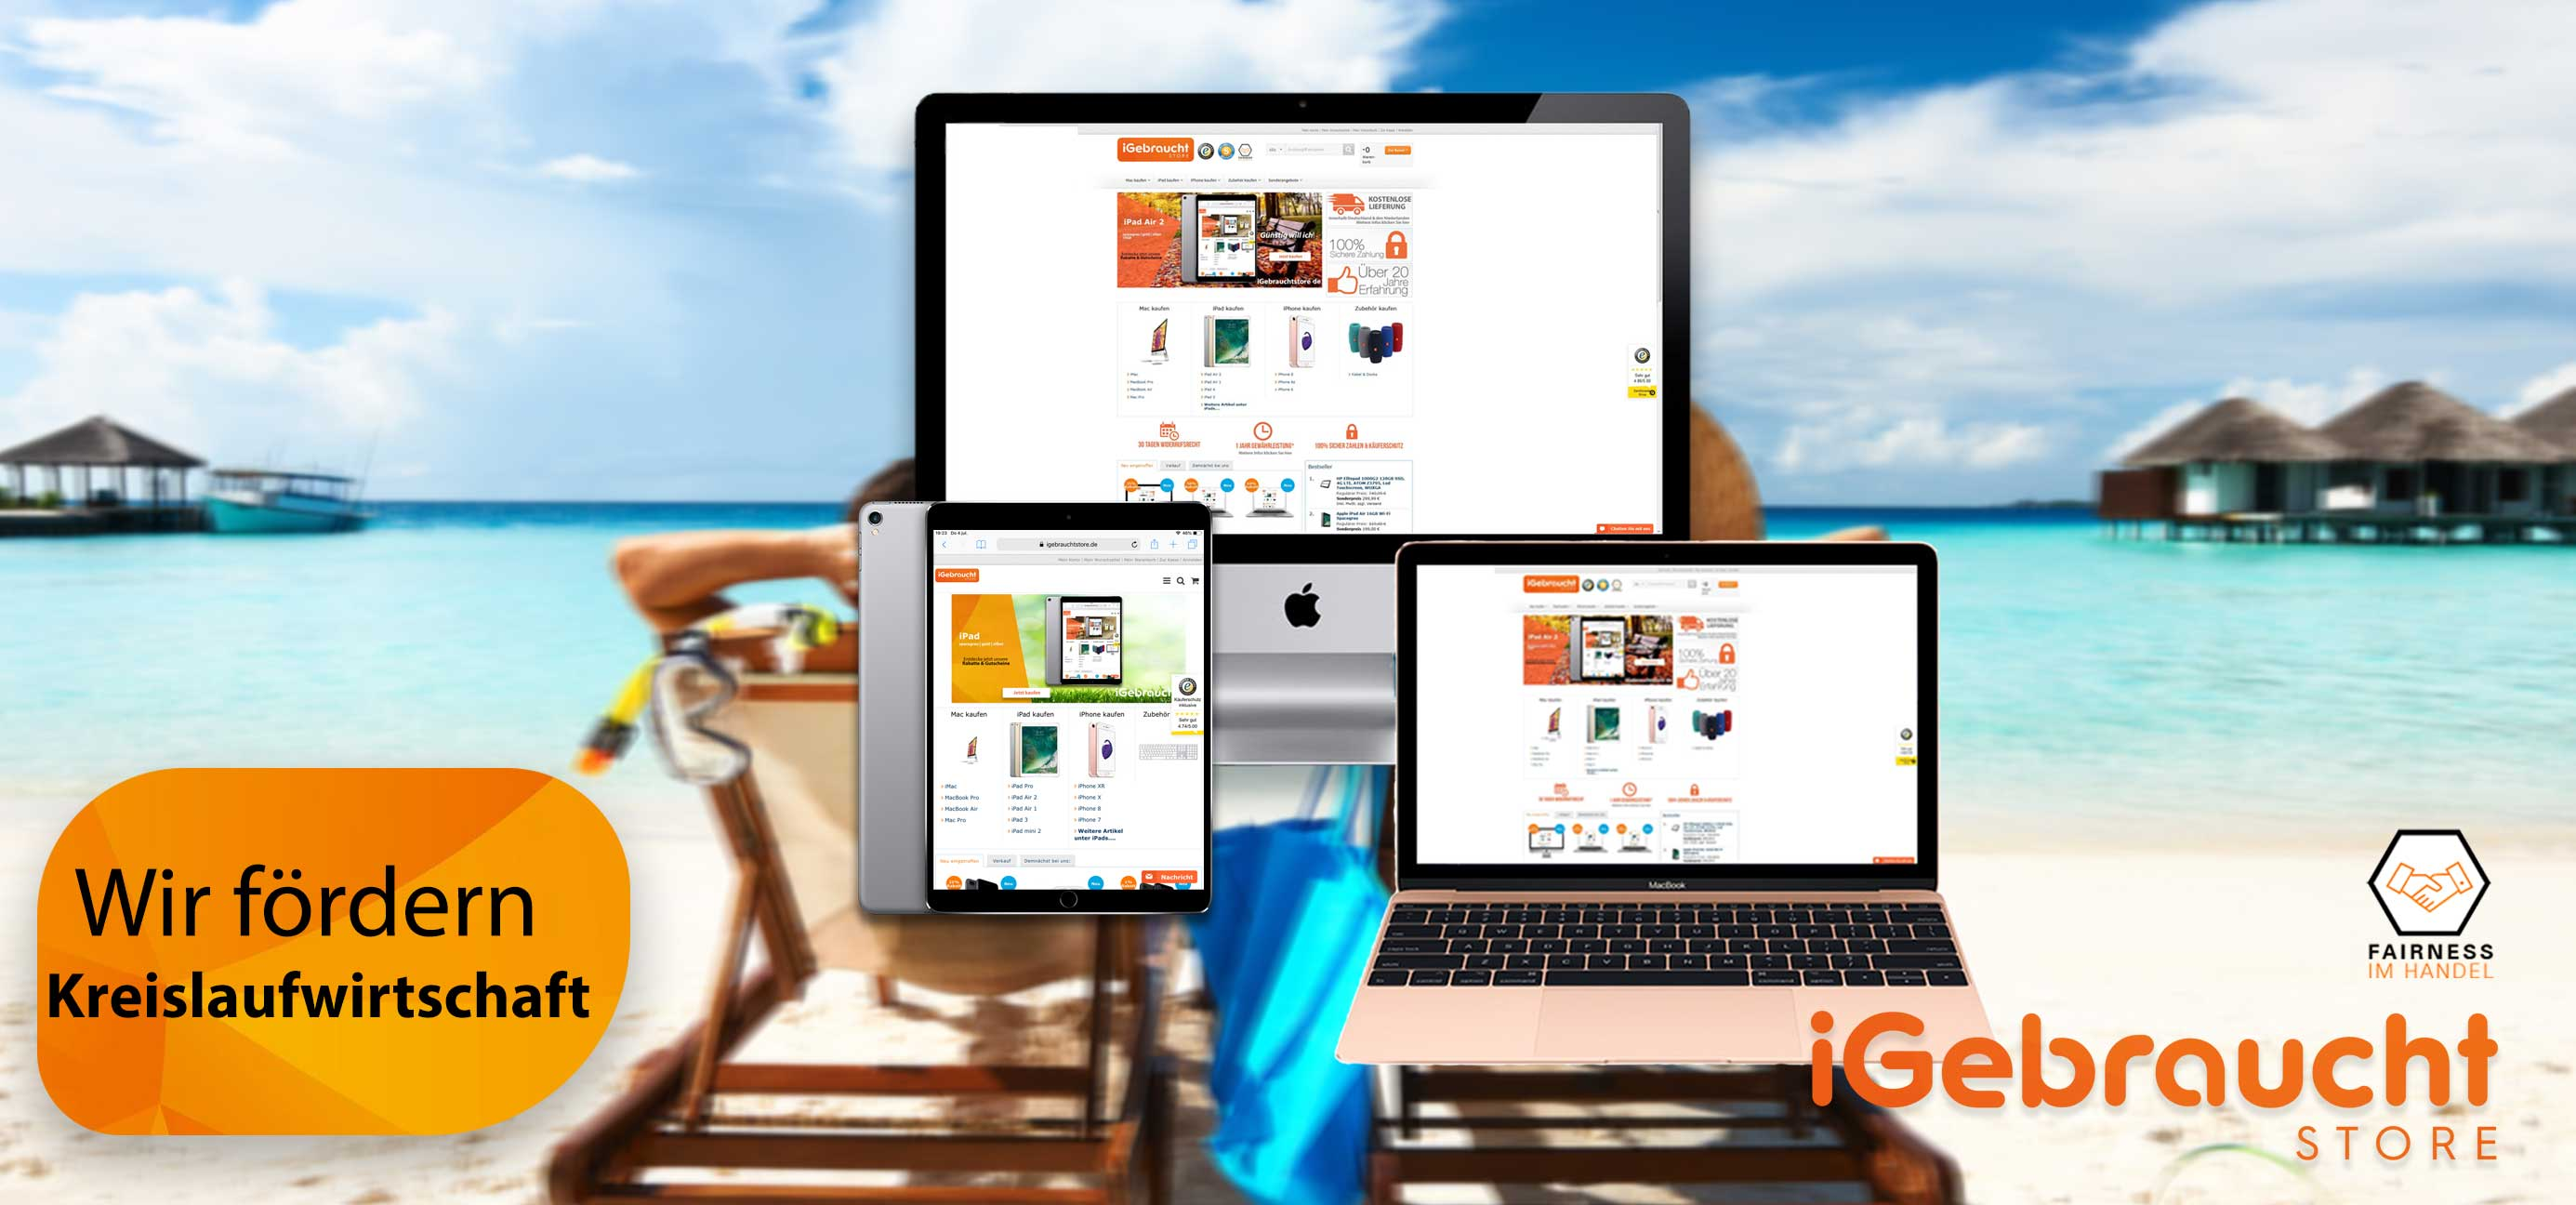 igebrauchtstore refurbished mac imac macbook pro ipad. Black Bedroom Furniture Sets. Home Design Ideas